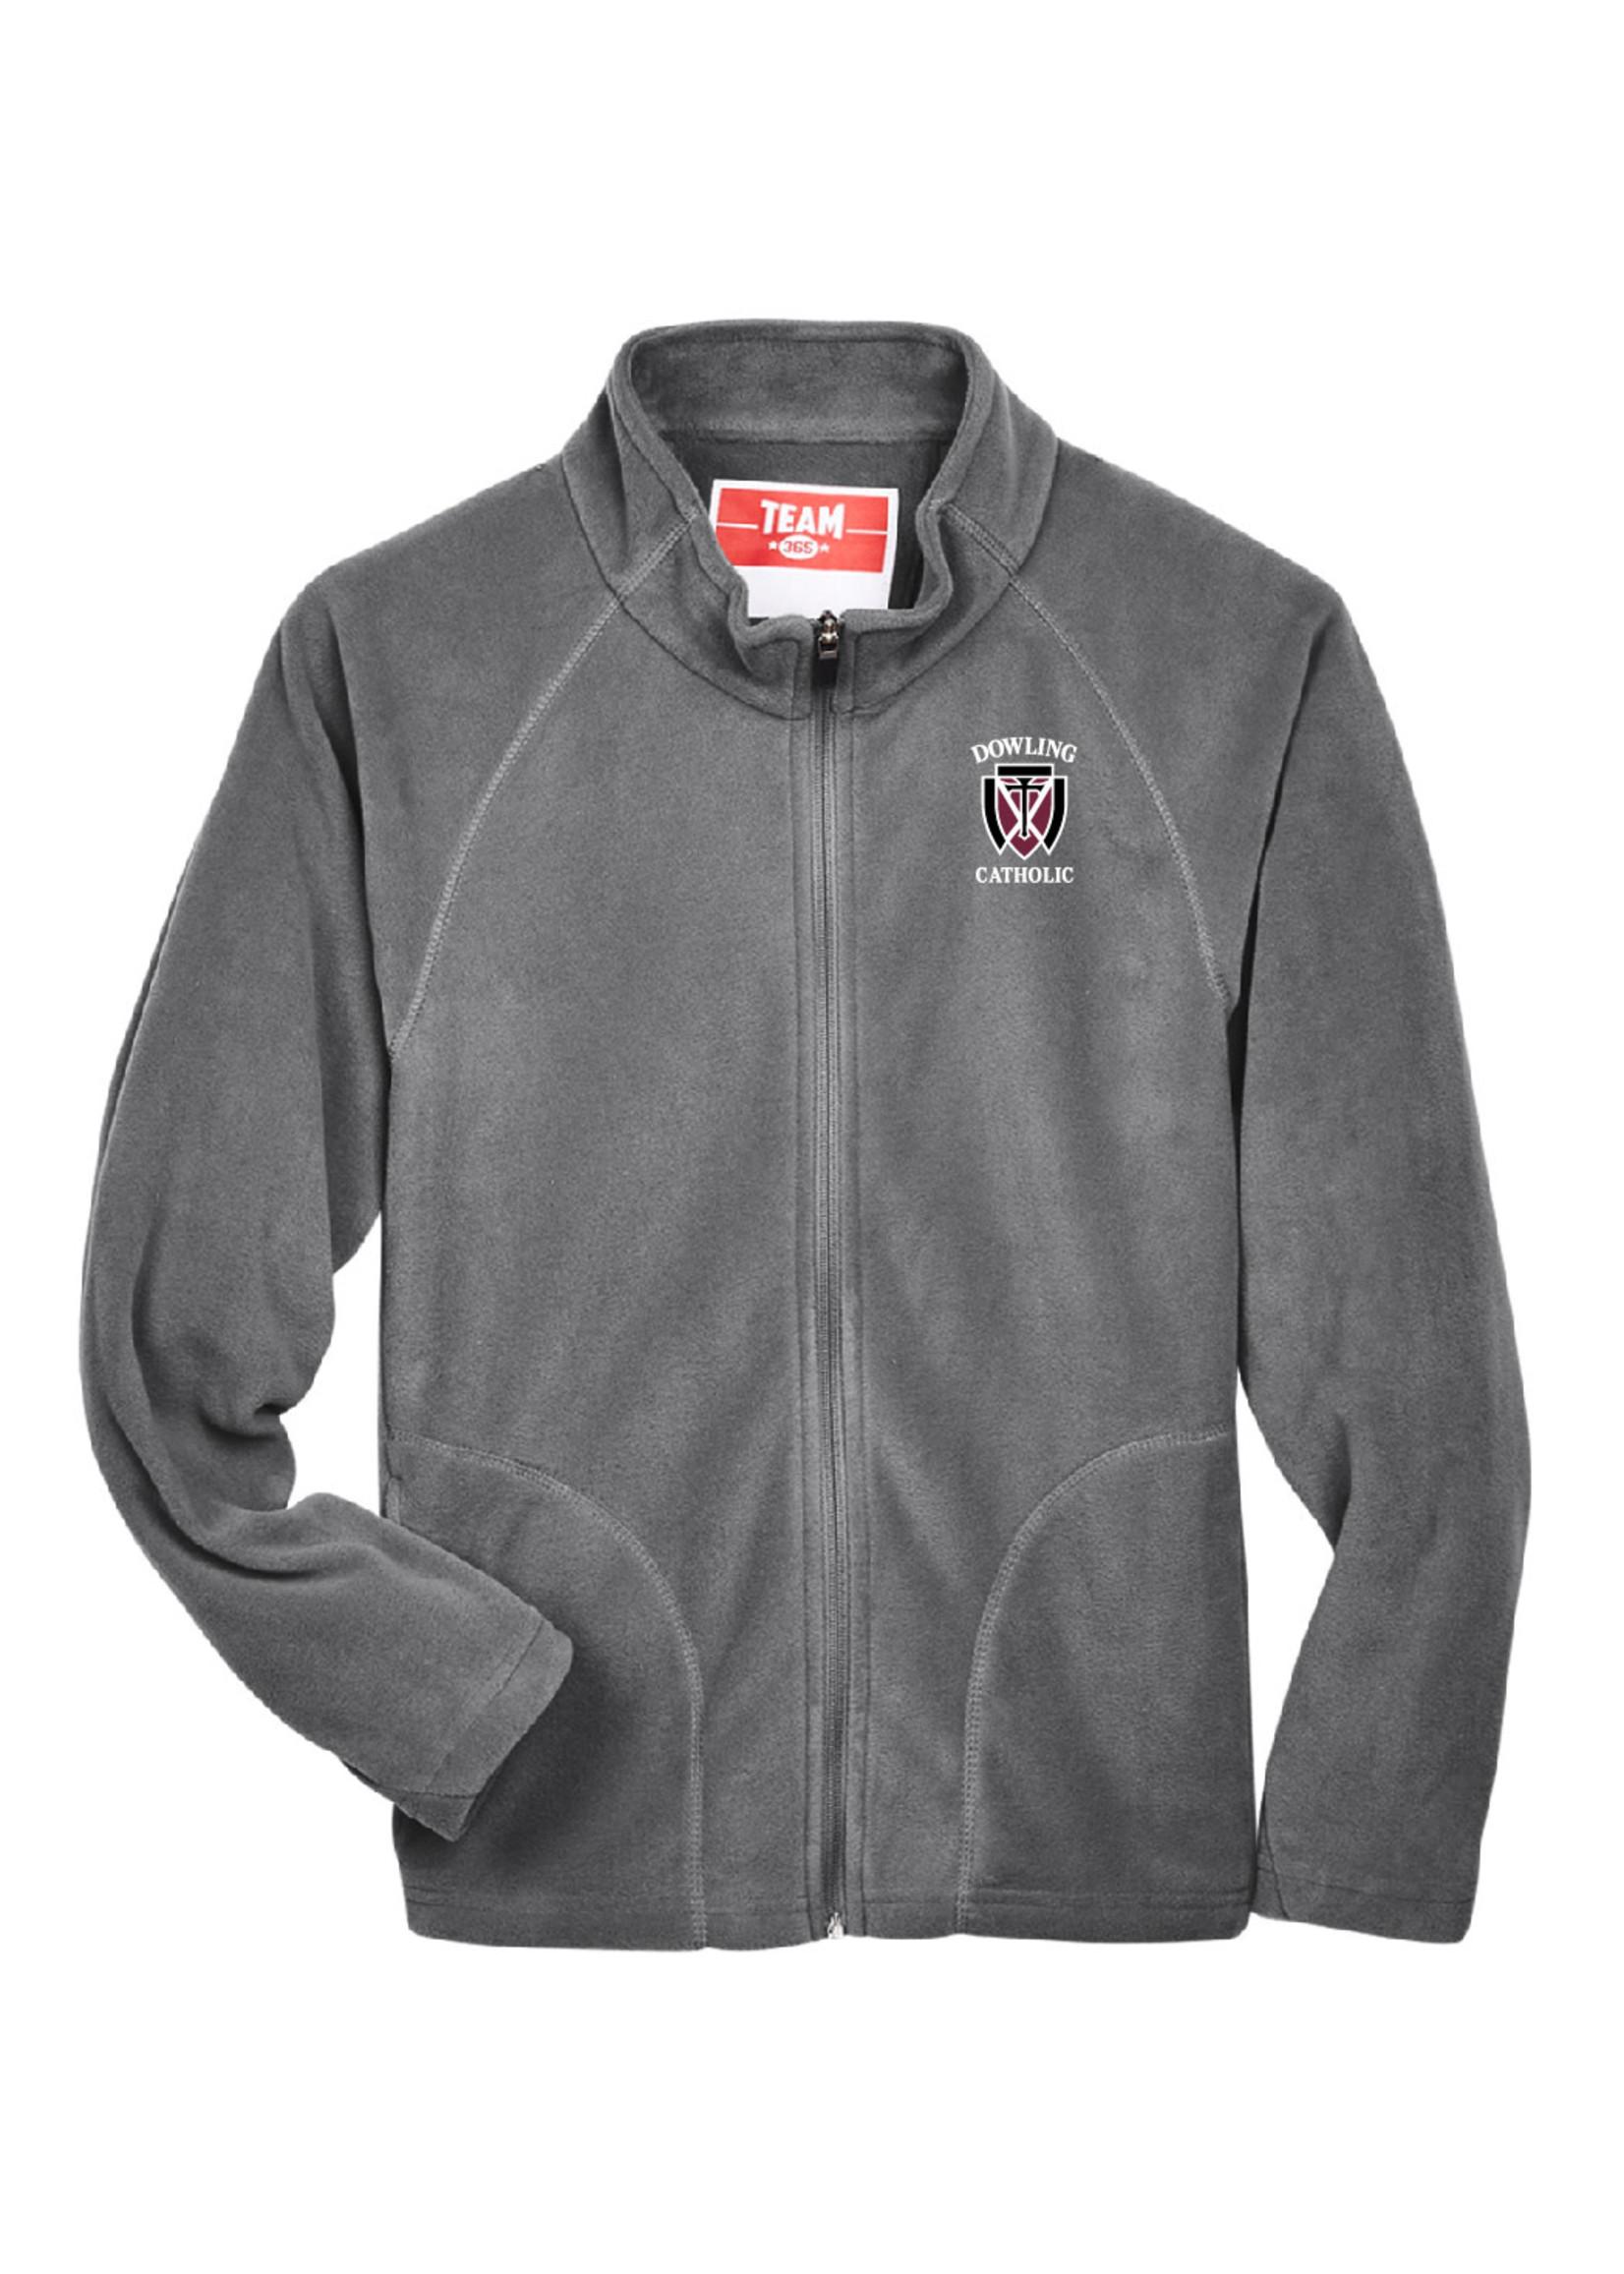 Team 365 Youth Fleece Uniform Jacket - ONLINE